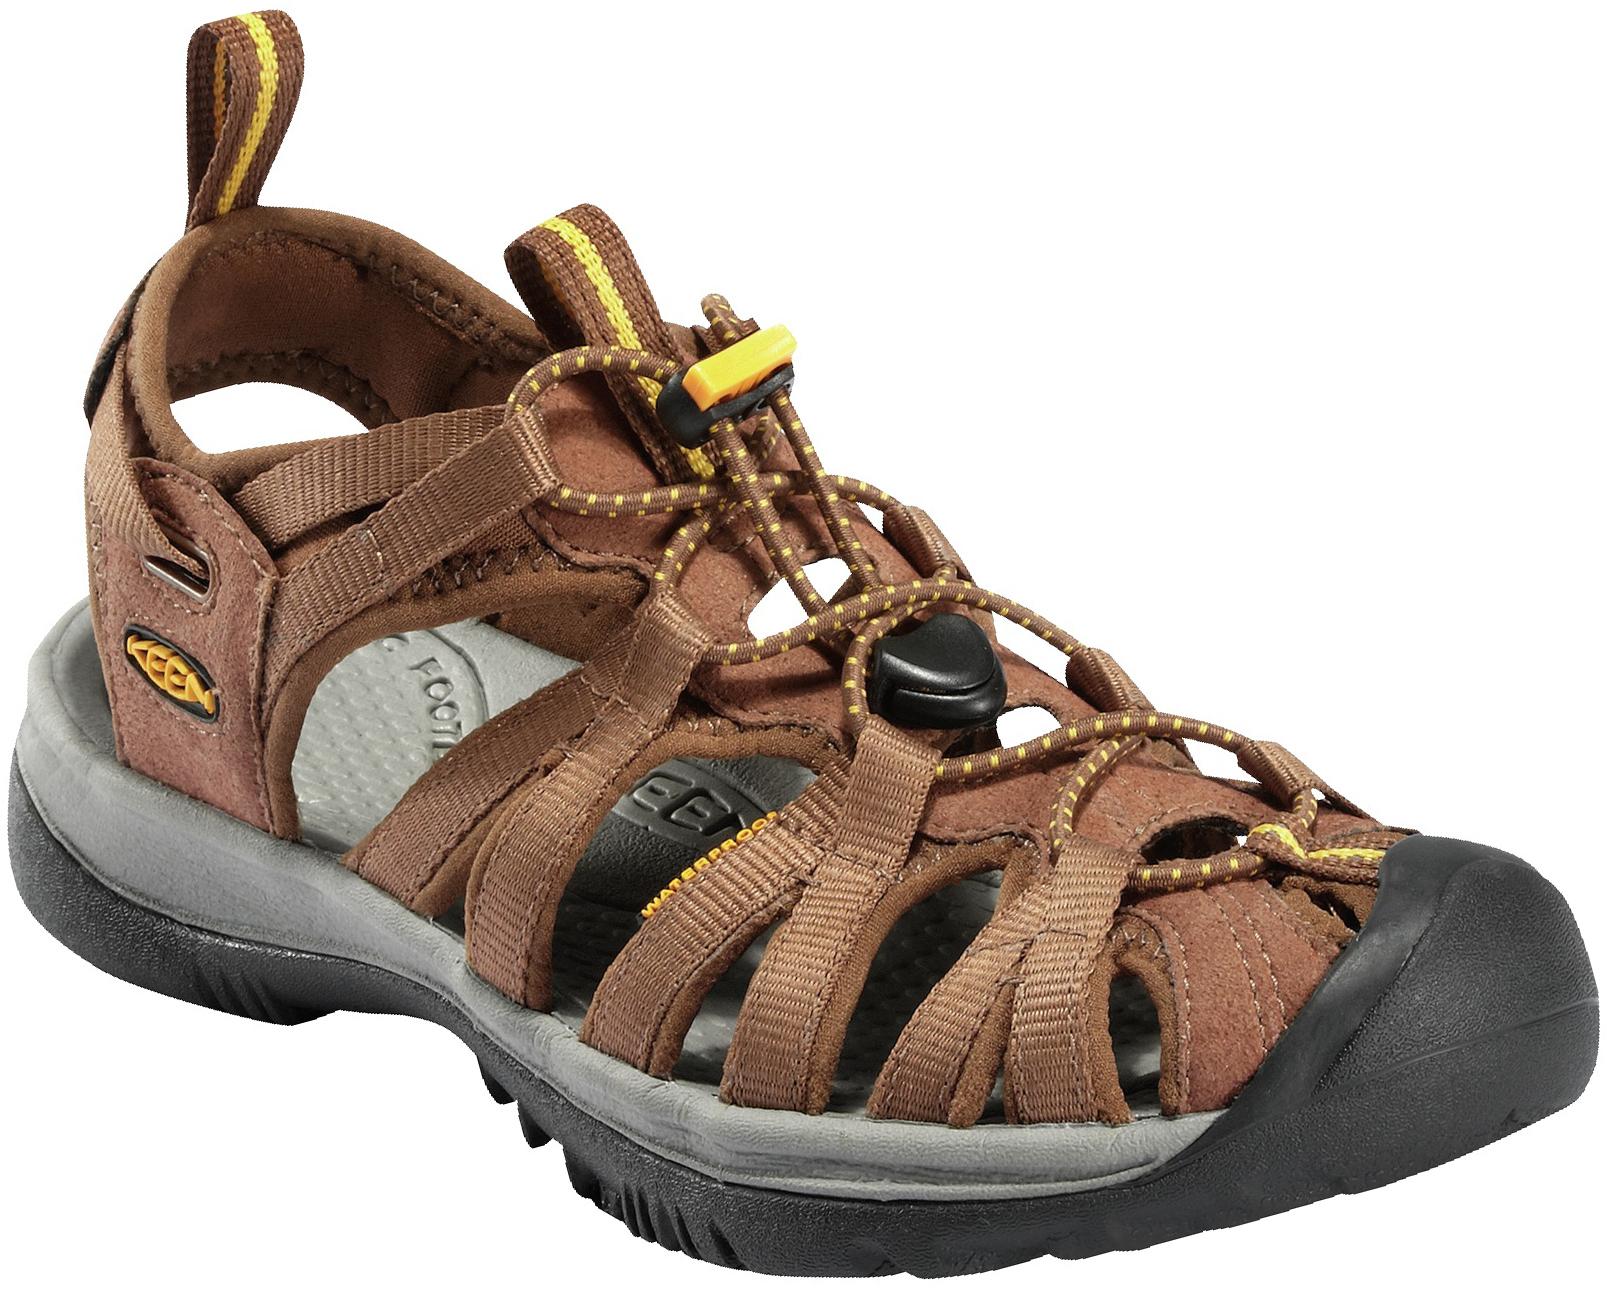 f925433f15b4 Keen Whisper Sandals - Women s